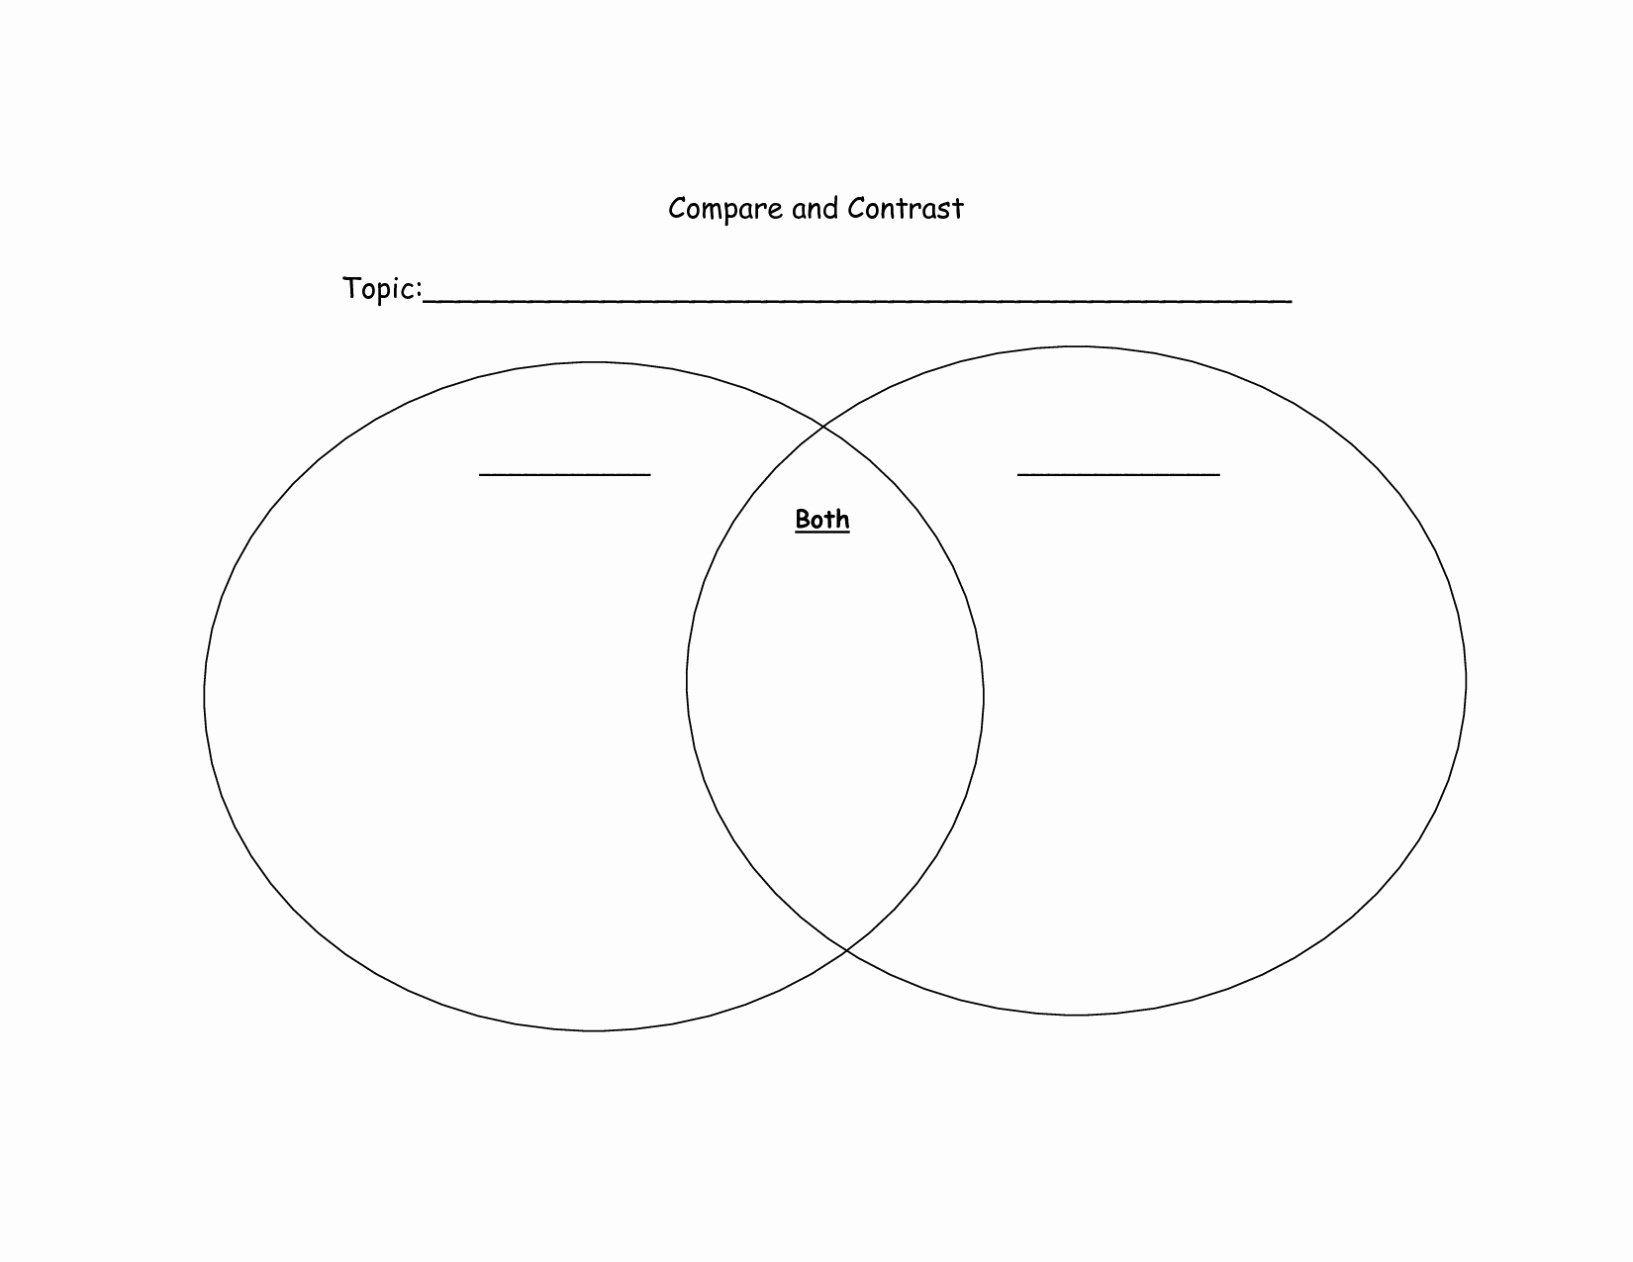 Venn Diagram Template Editable In 2020 Venn Diagram